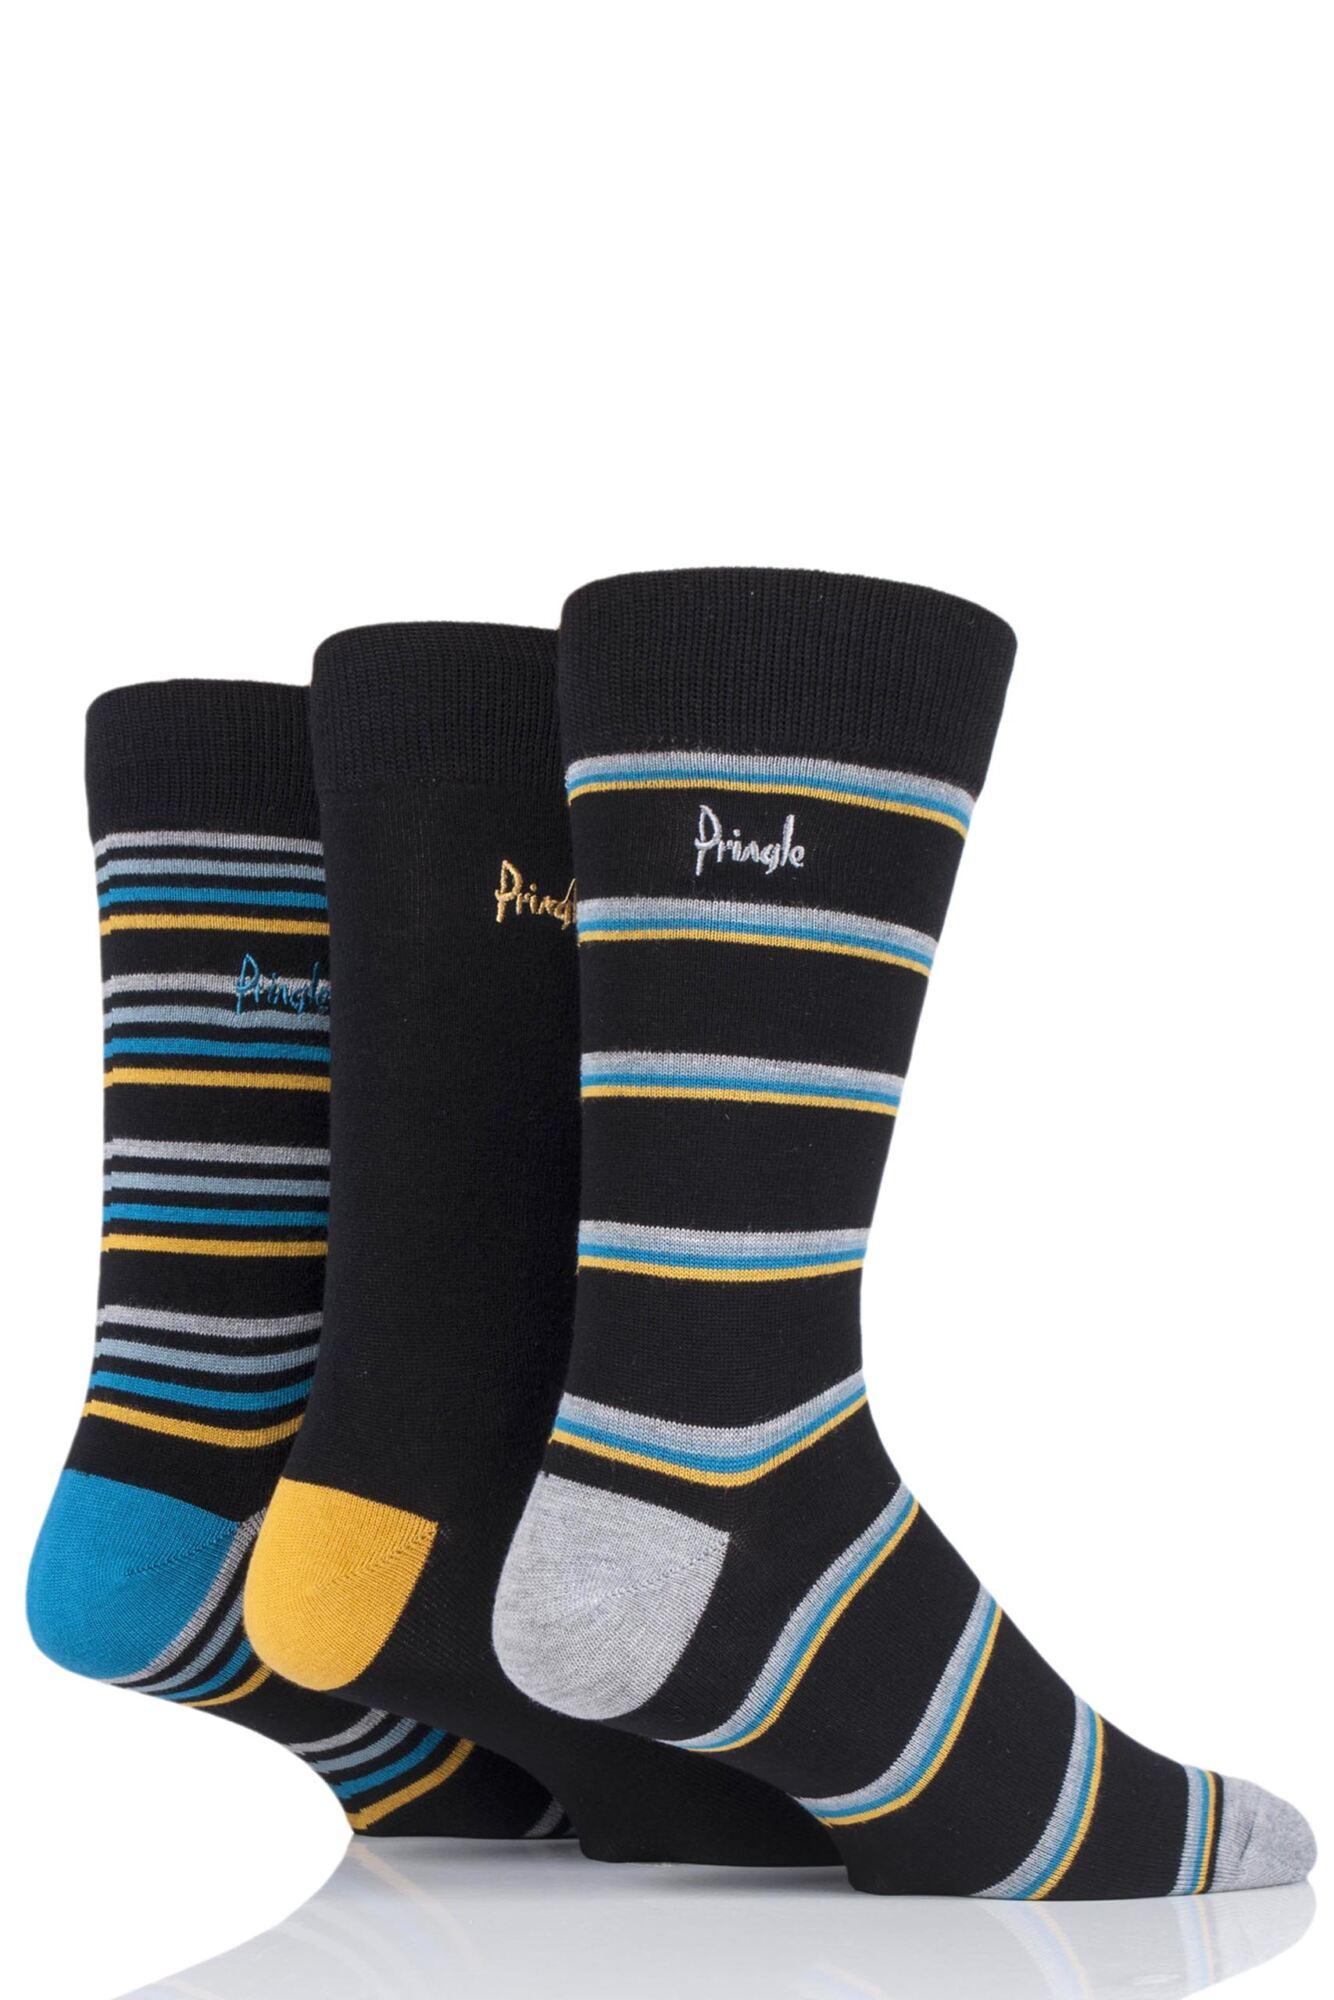 3 Pair Lucas Striped Bamboo Socks Men's - Pringle